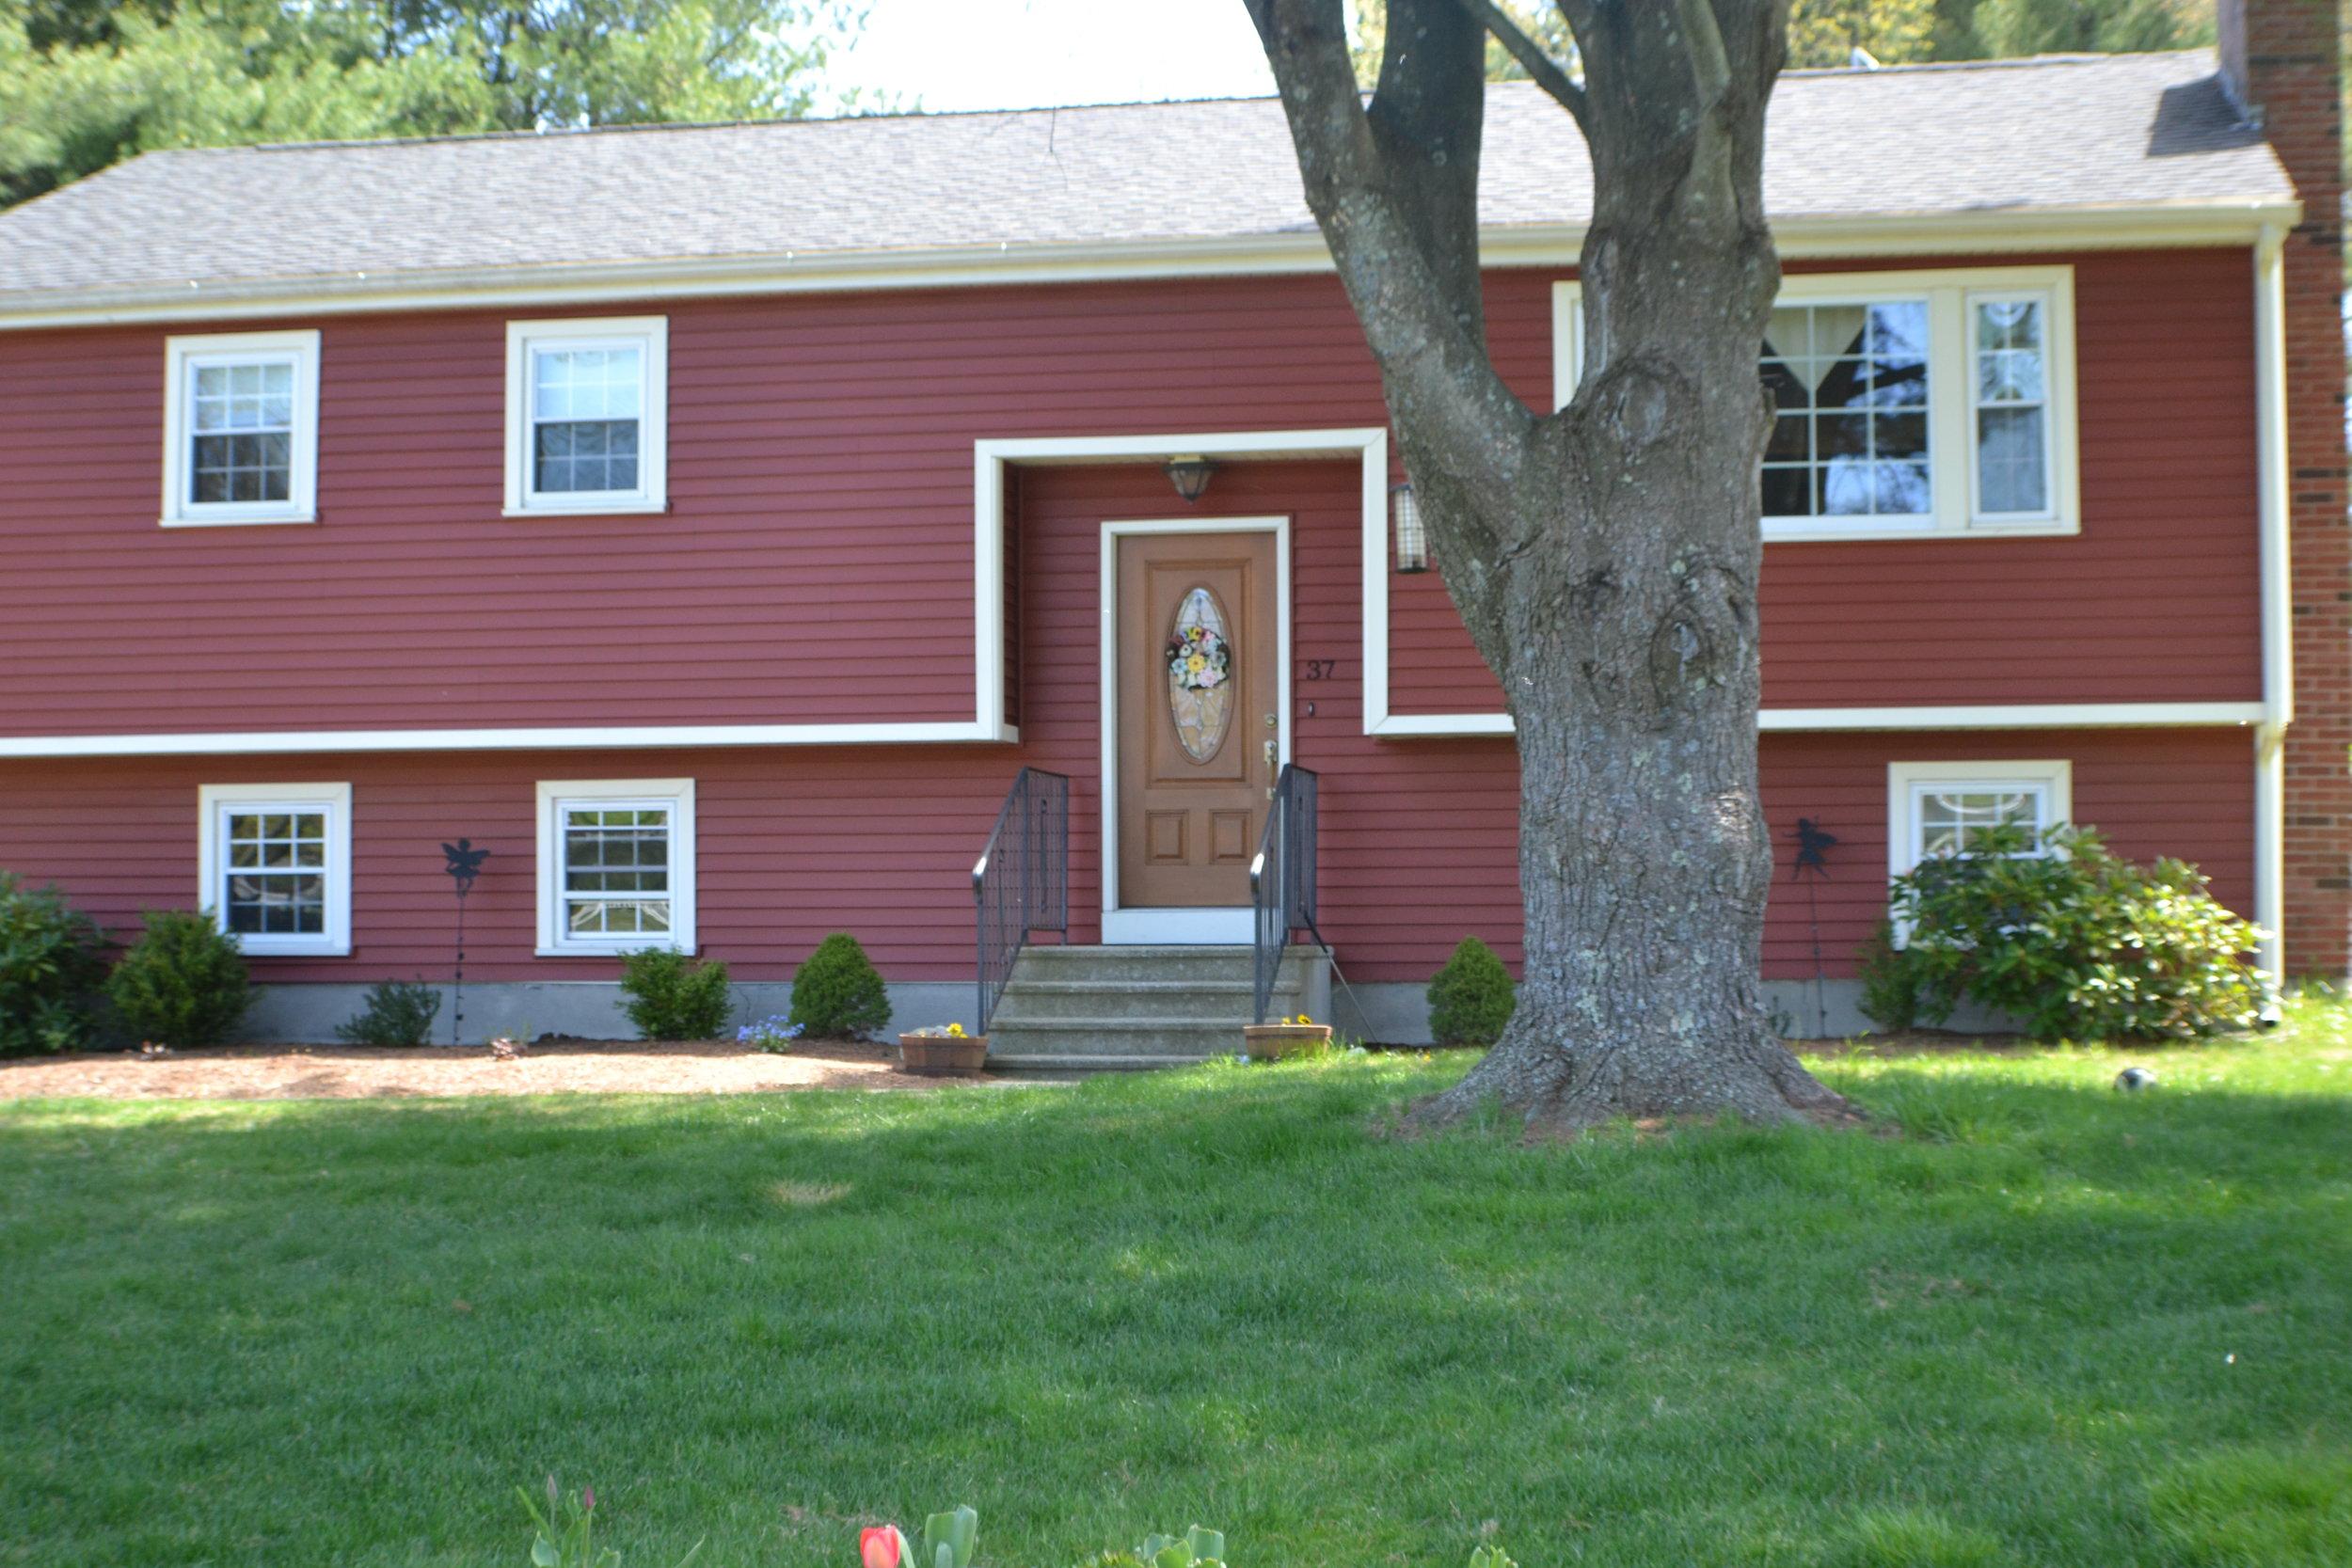 My childhood home 37 Juniper Brook Rd, Northboro MA